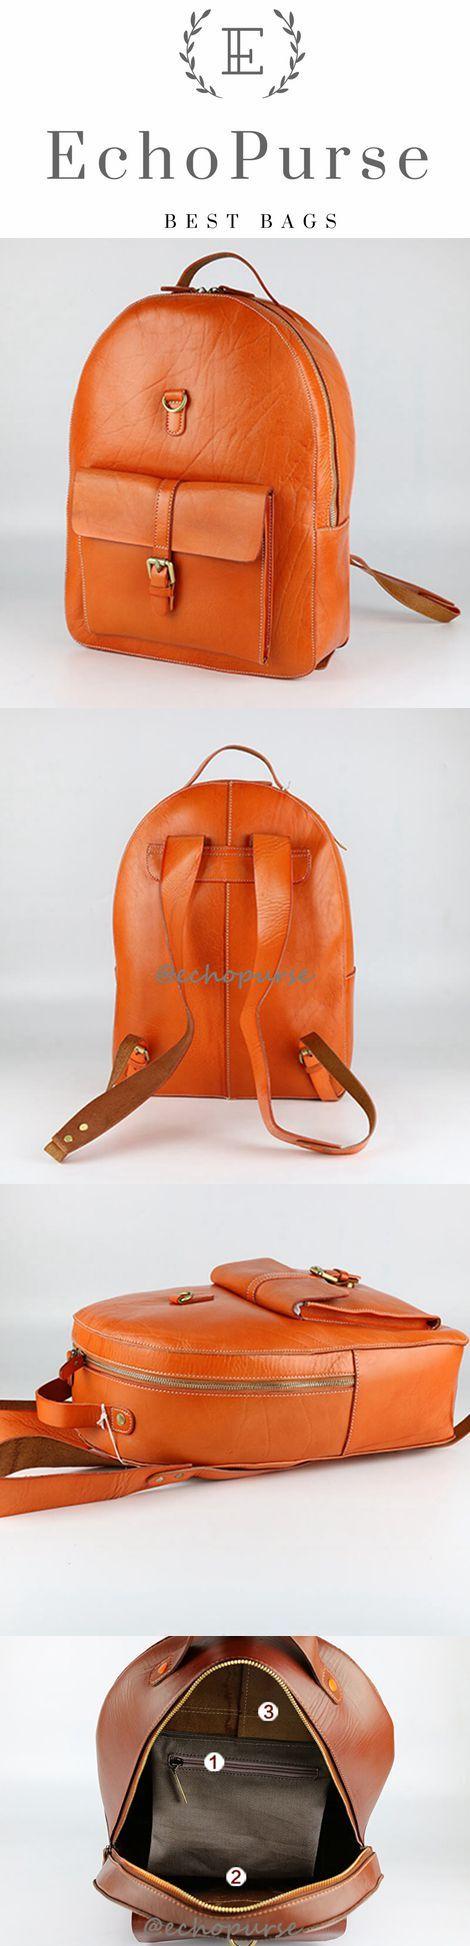 Top Grain Leather Backpack For Man, Best Backpacks,Travel Backpack 6200